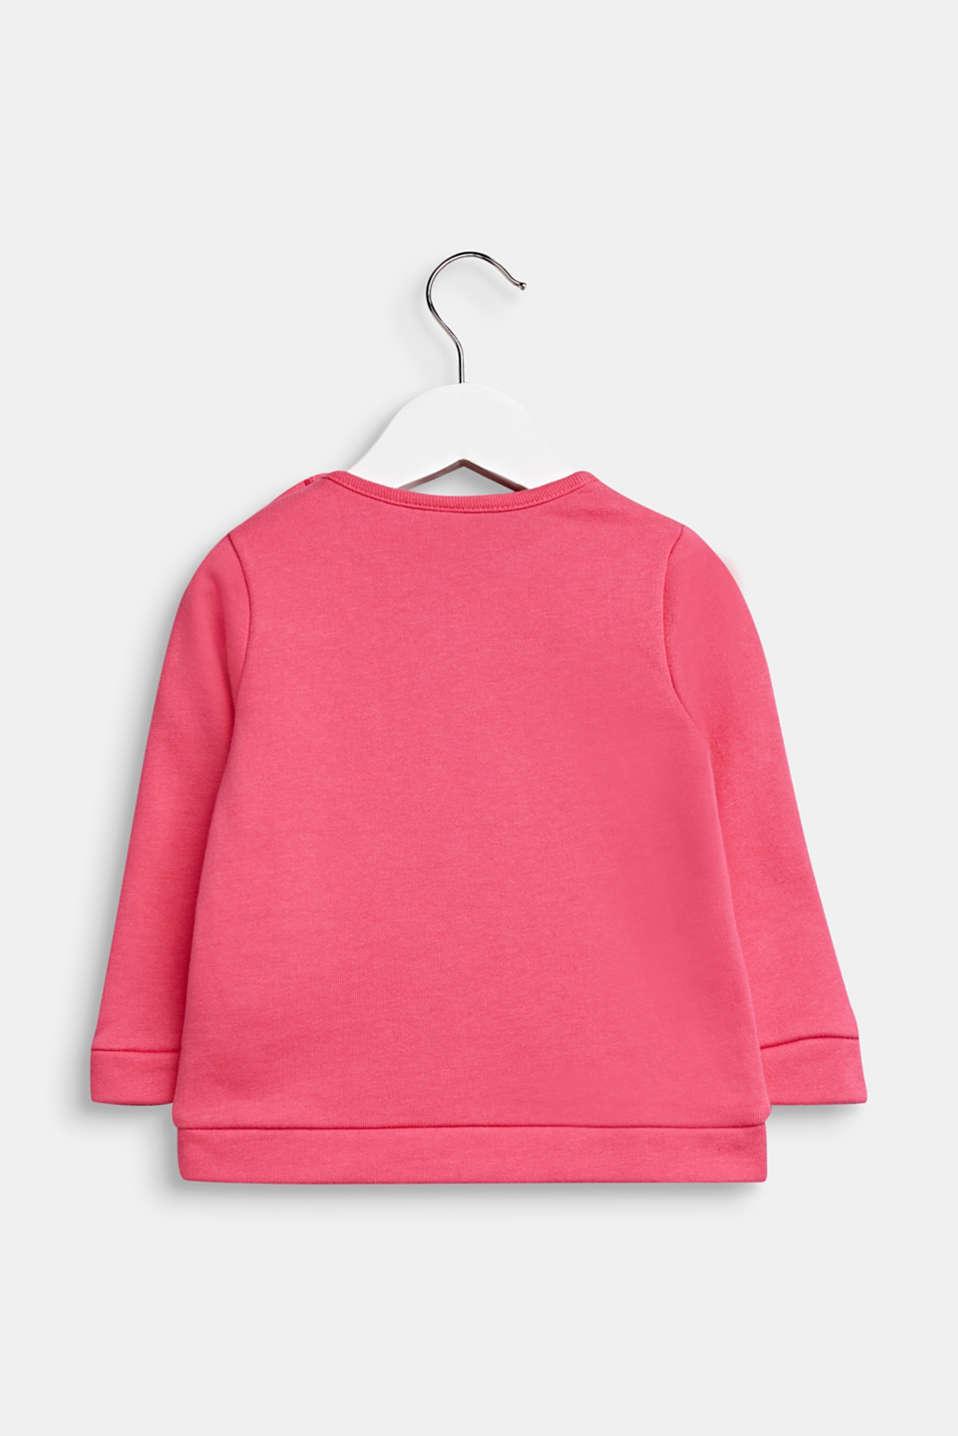 Heart print sweatshirt, 100% cotton, LCCANDY PINK, detail image number 1